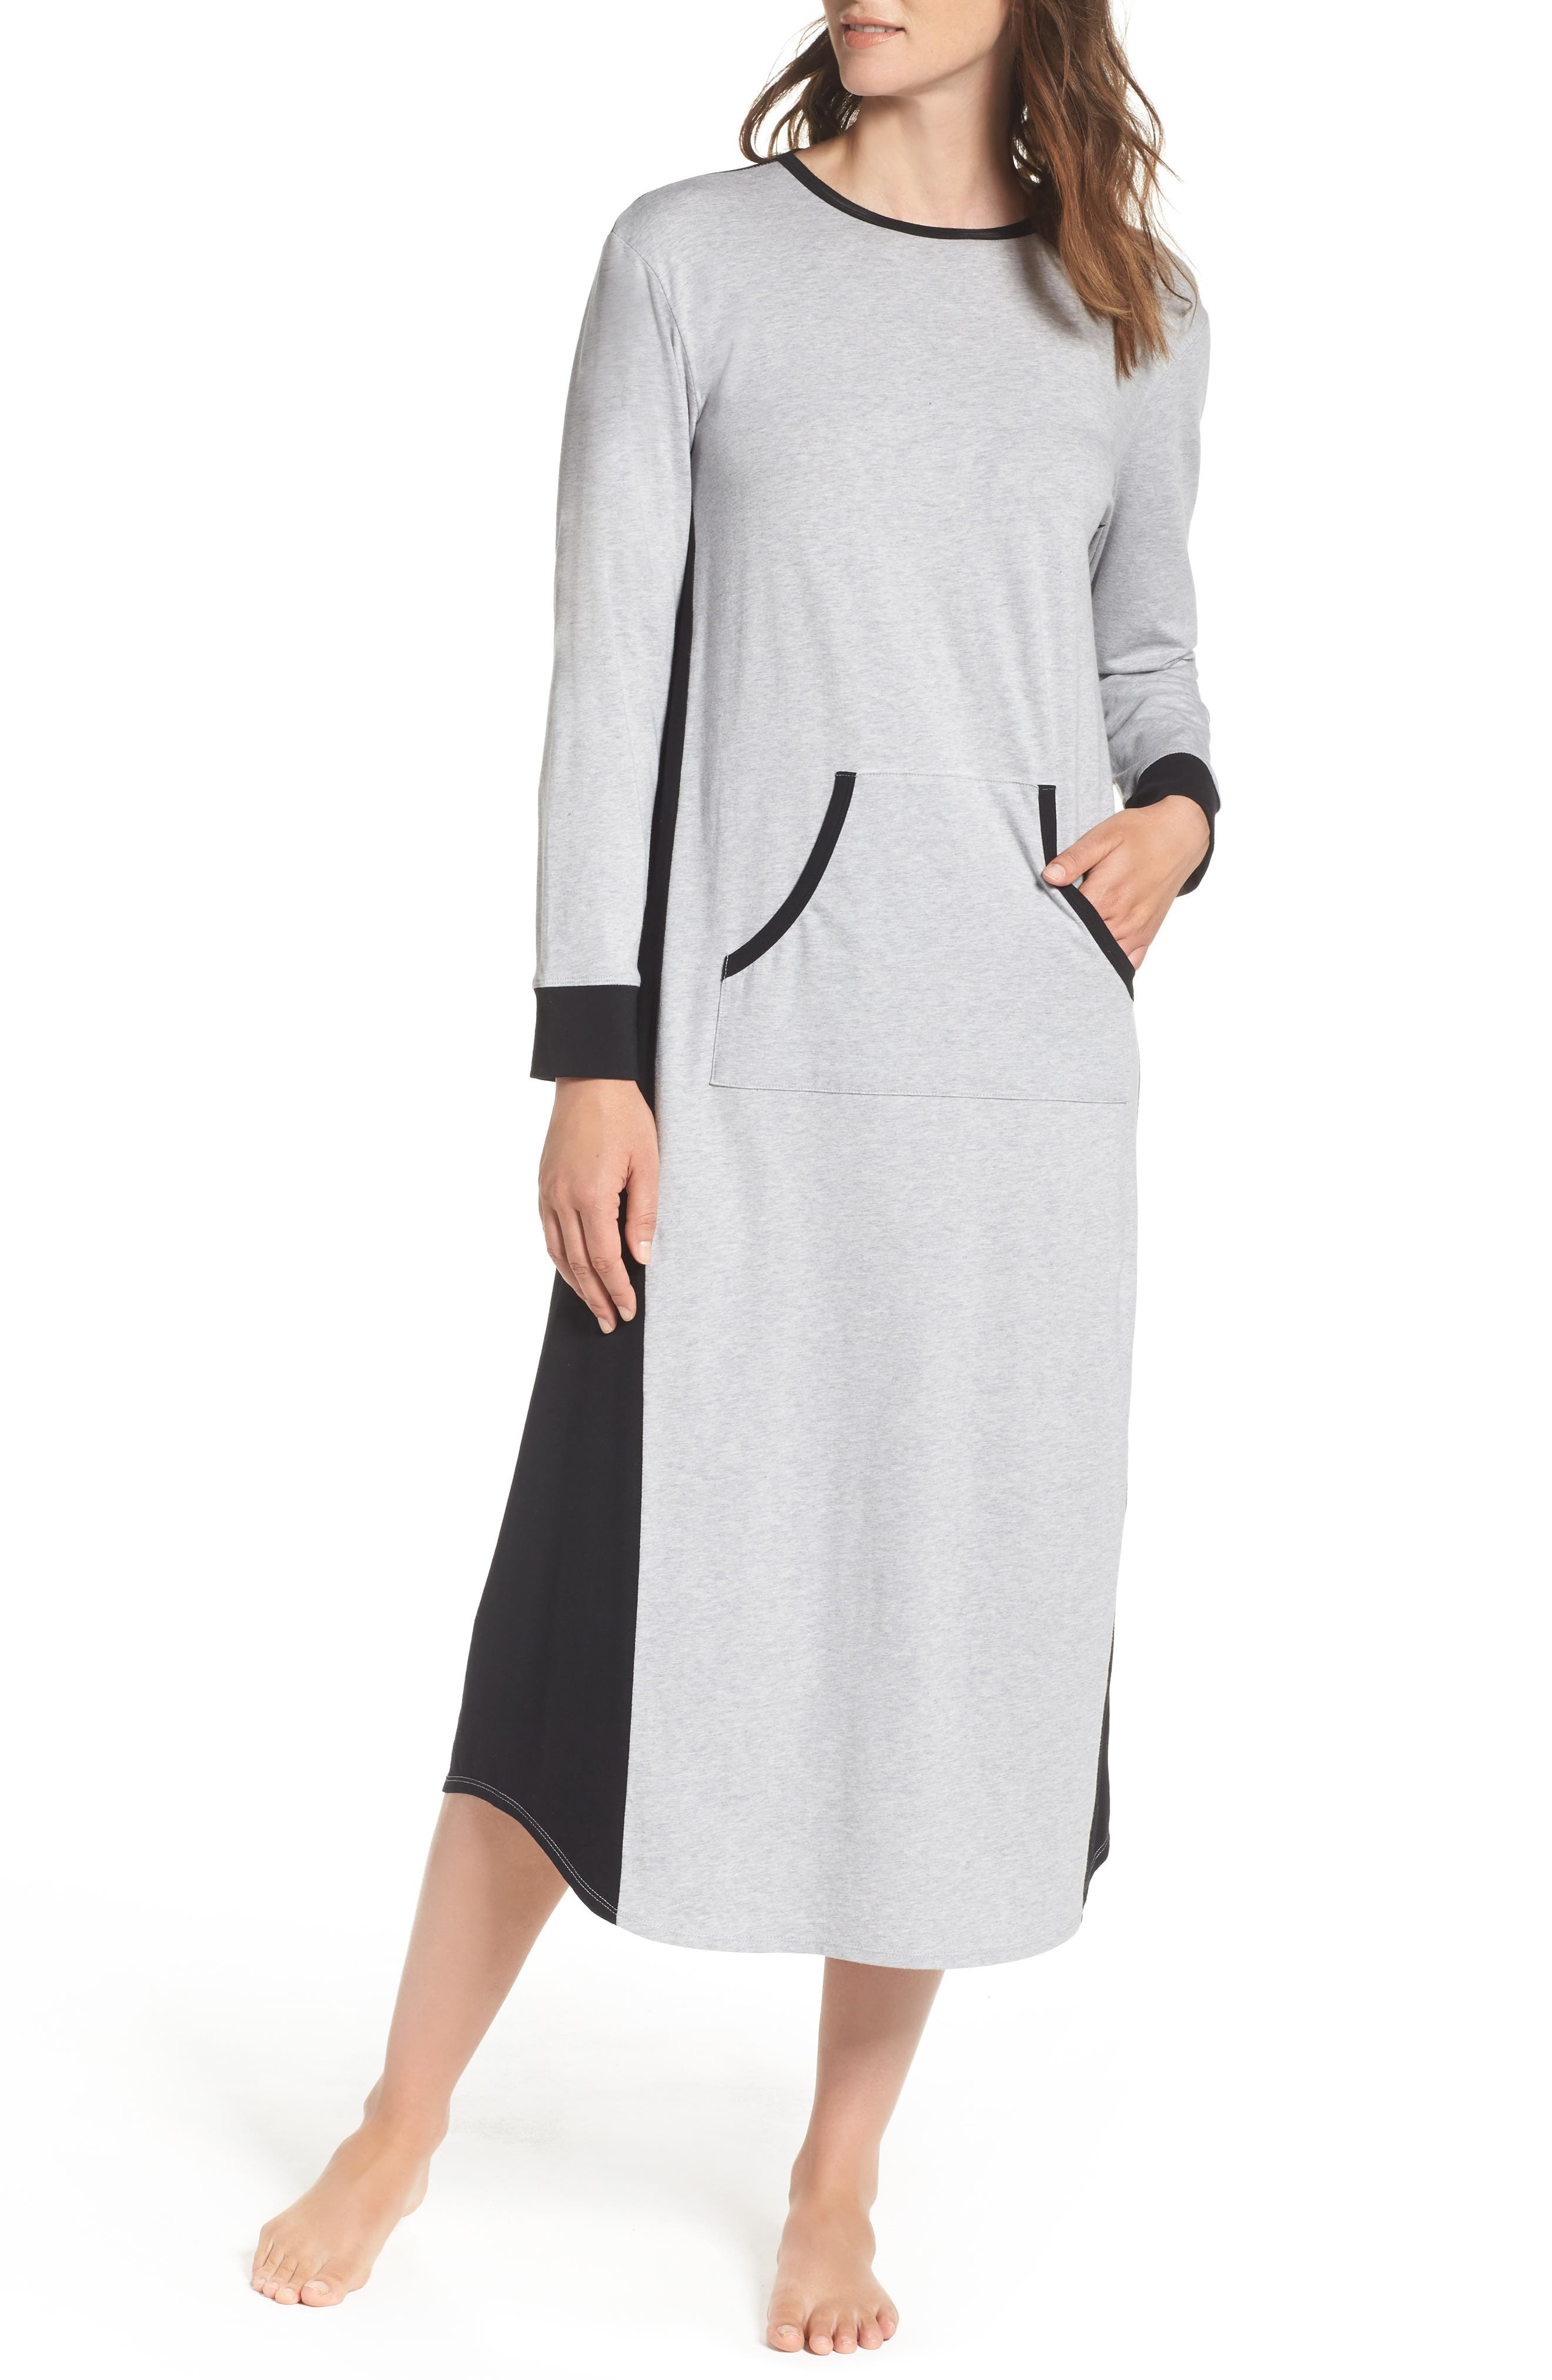 Lounger Sleep Shirt,                         Main,                         color, Metro Grey Heather